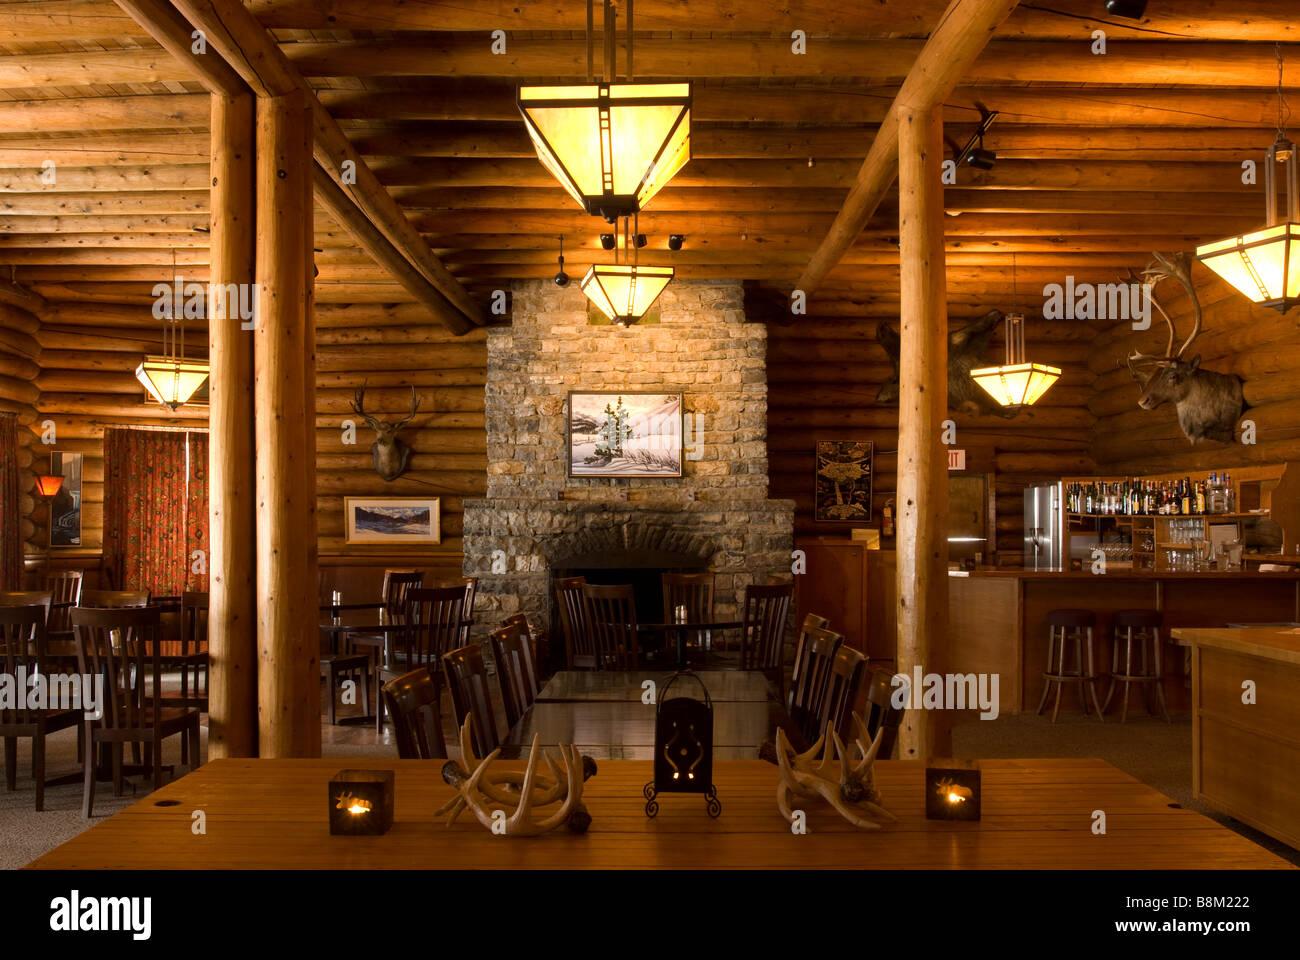 Num Ti Jah Lodge, Banff National Park, Alberta, Canada - Stock Image